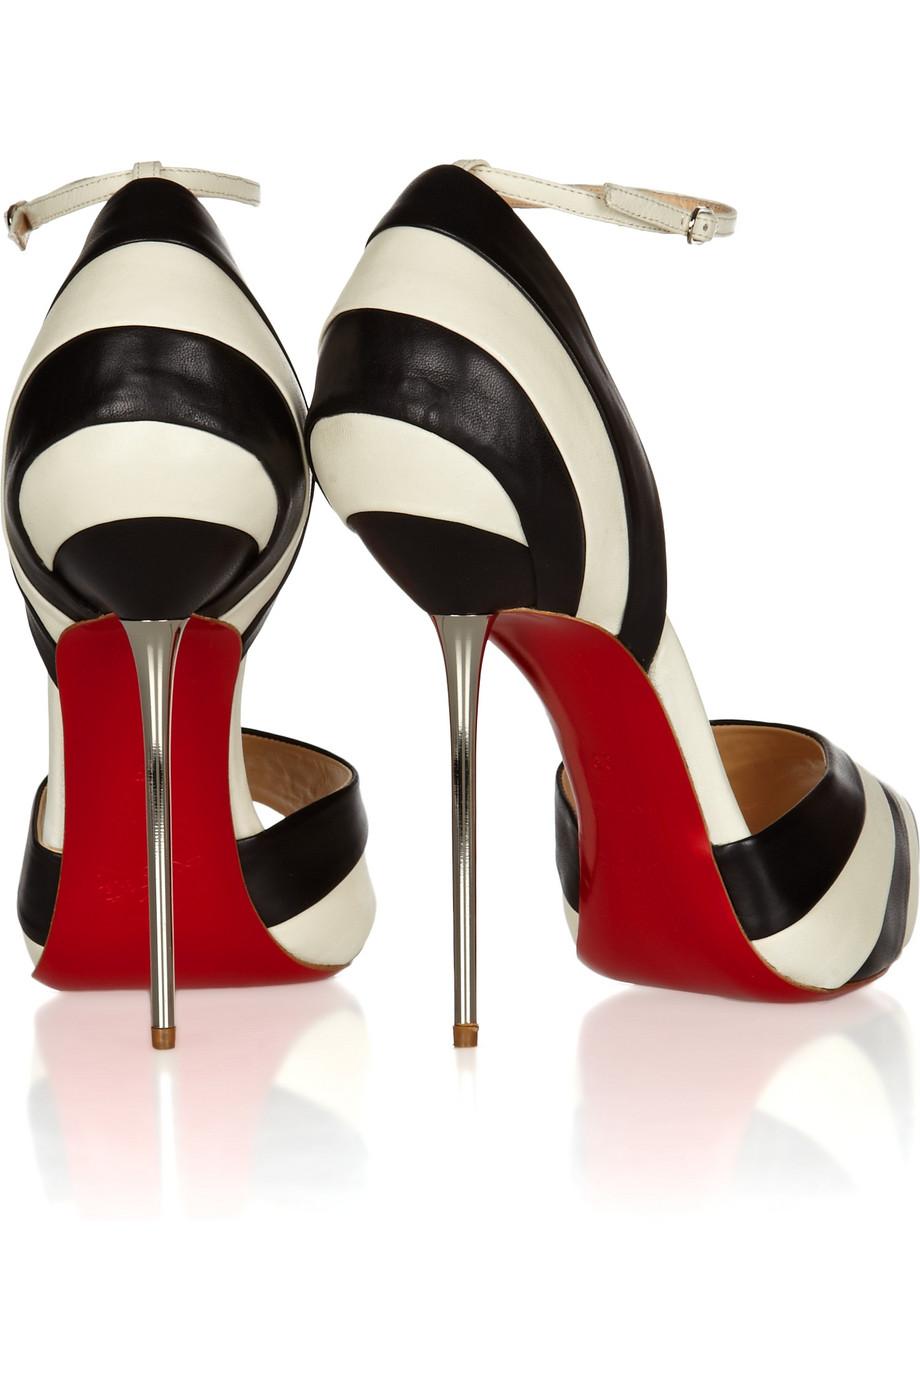 fake loubitons - Life\u0026#39;s a shoe: Black and White Louboutins